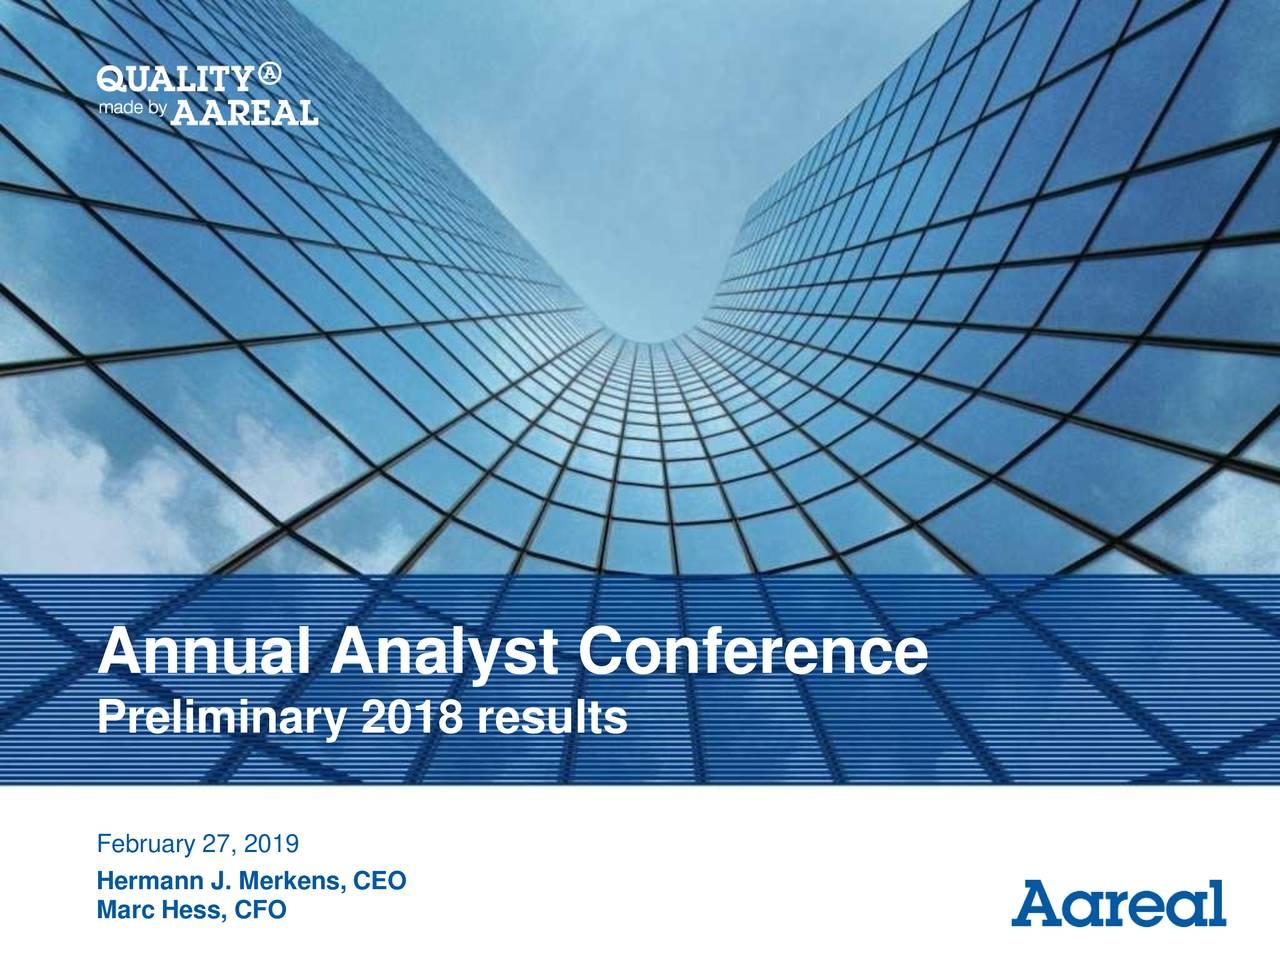 Preliminary 2018 results February 27, 2019 Hermann J. Merkens, CEO Marc Hess, CFO